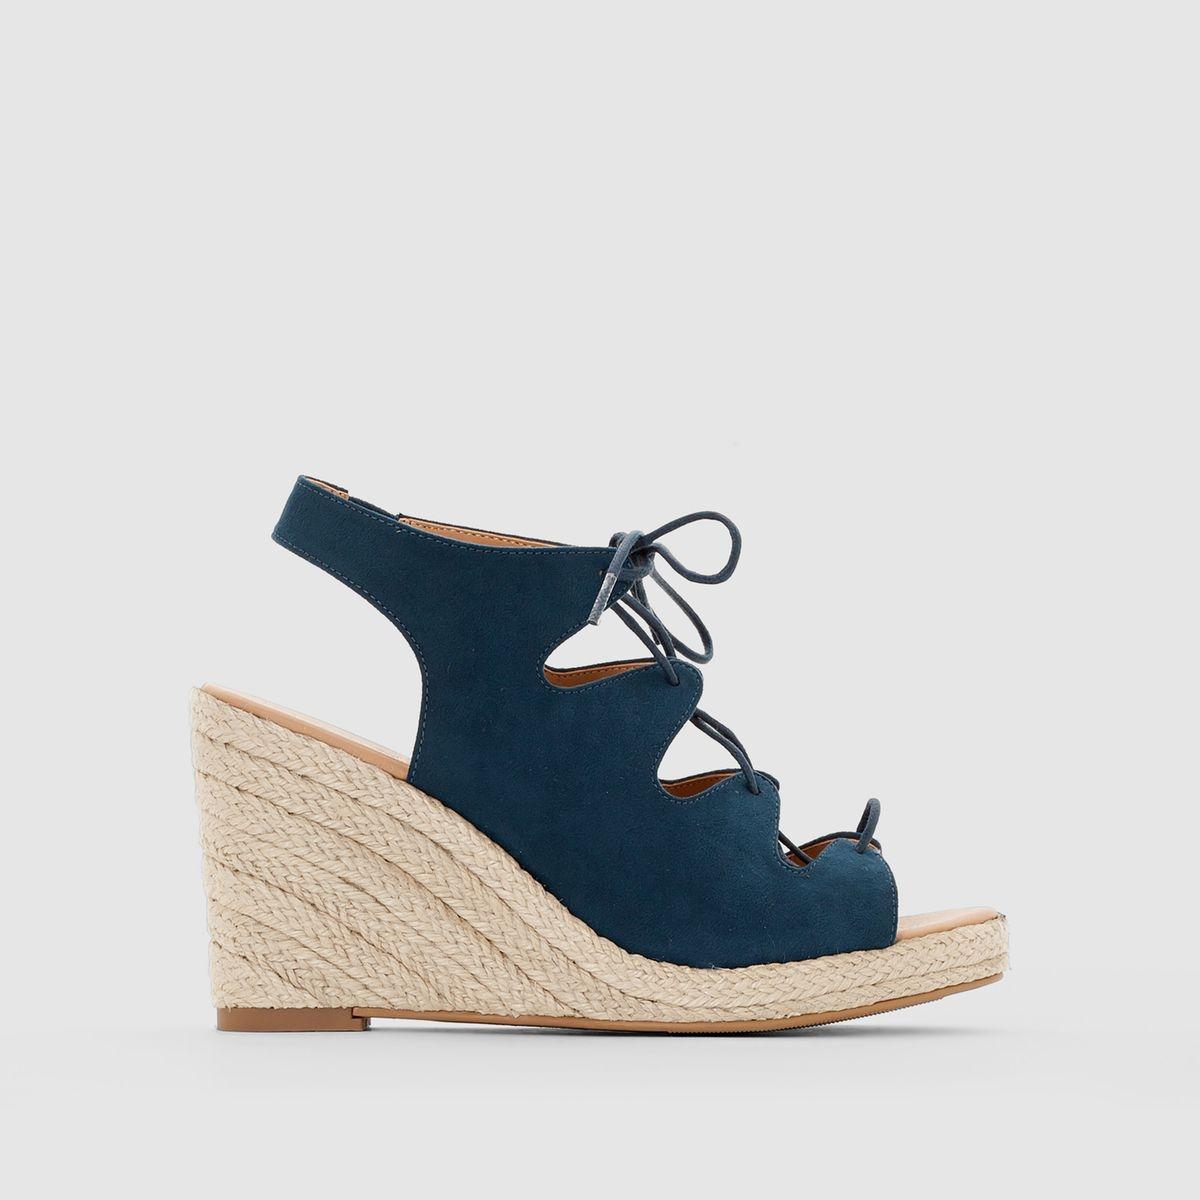 Sandales synthétique